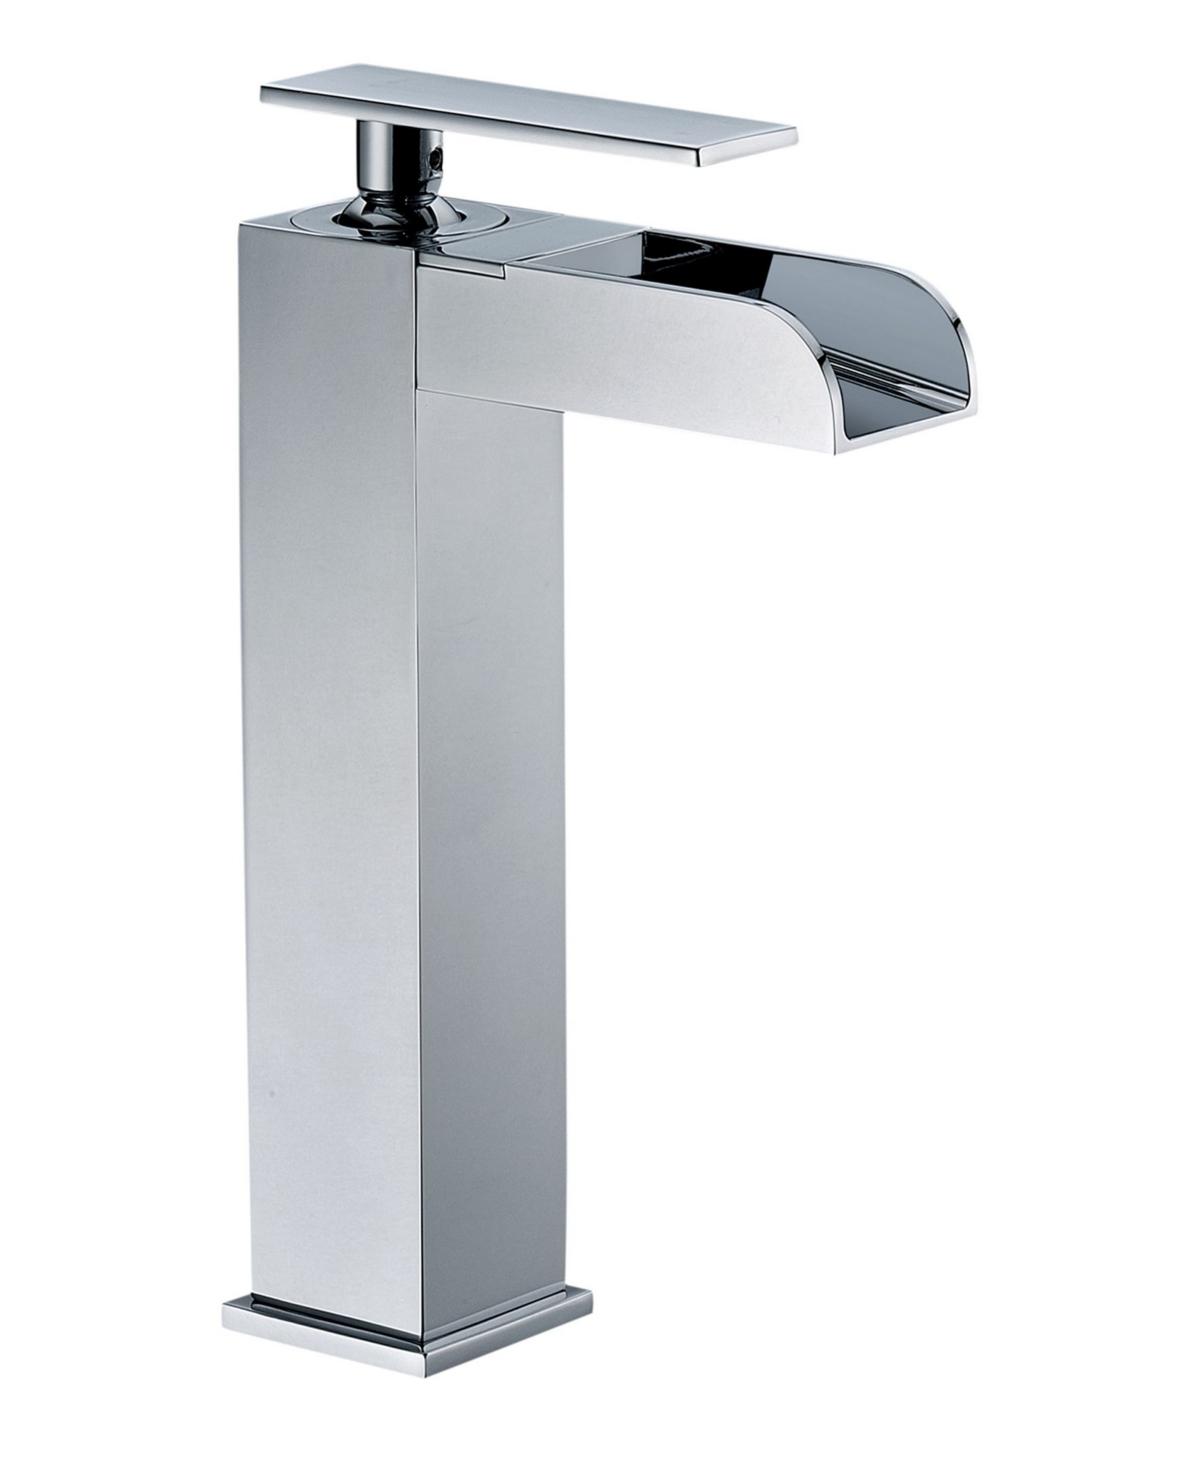 Alfi brand Polished Chrome Single Hole Tall Waterfall Bathroom Faucet Bedding